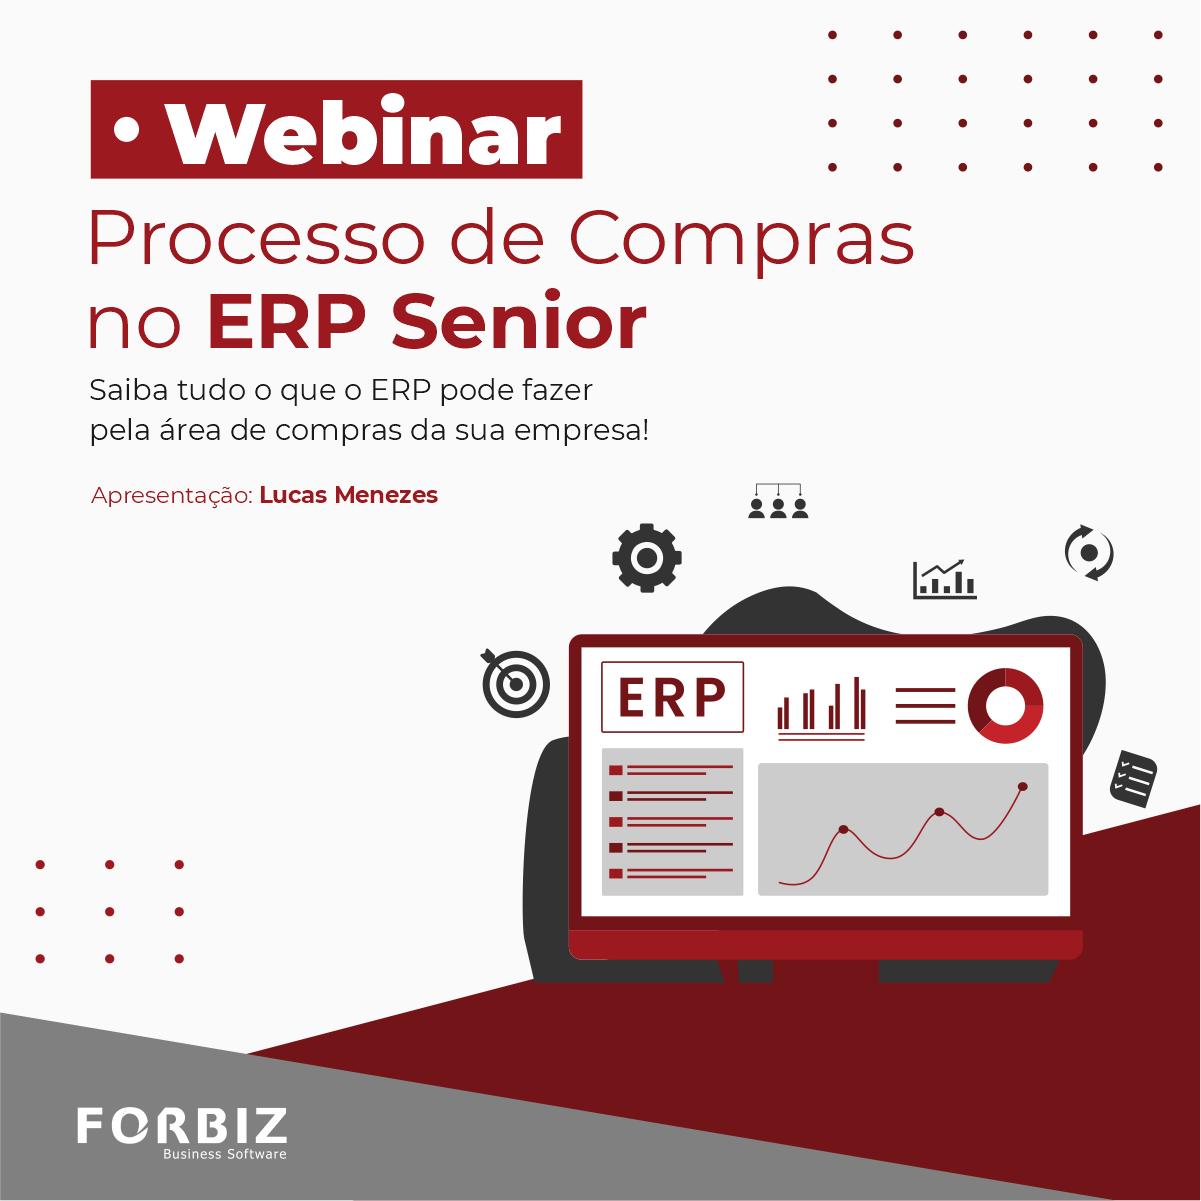 Webinar Processo de Compras no ERP Senior